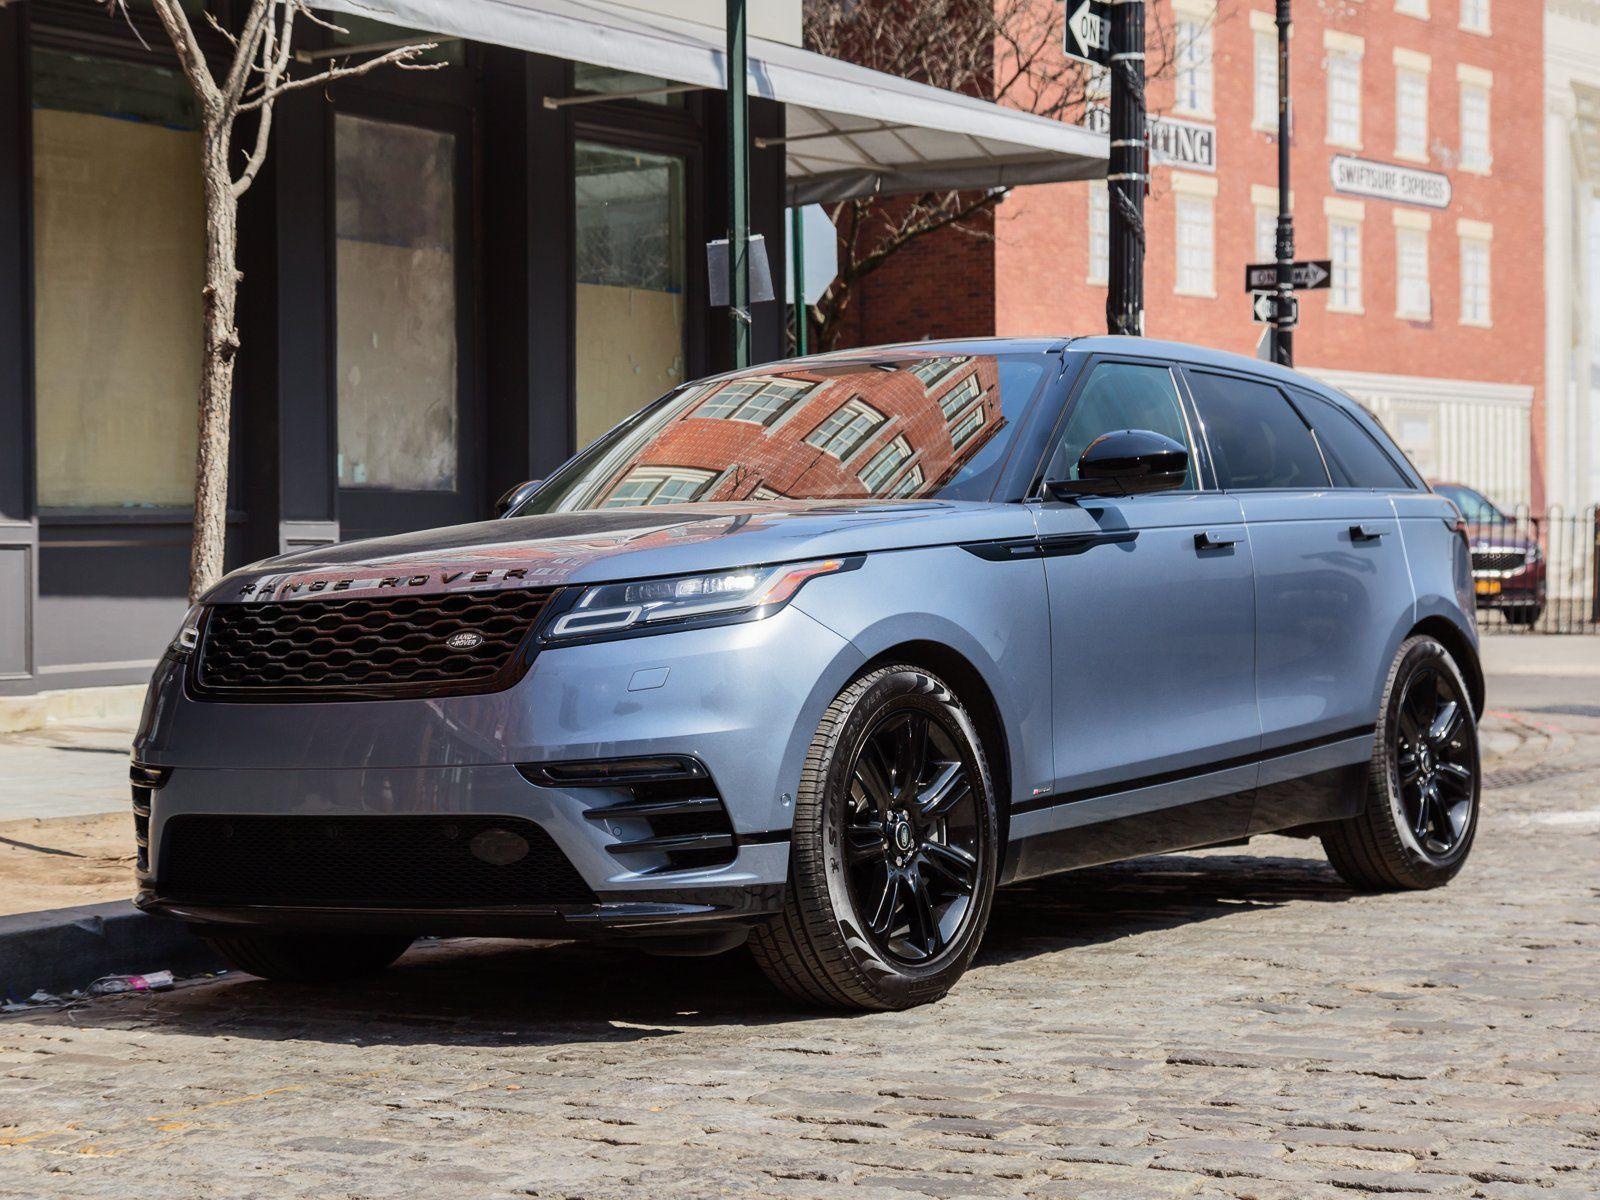 Range Rover Velar SUV review Features, photos Range